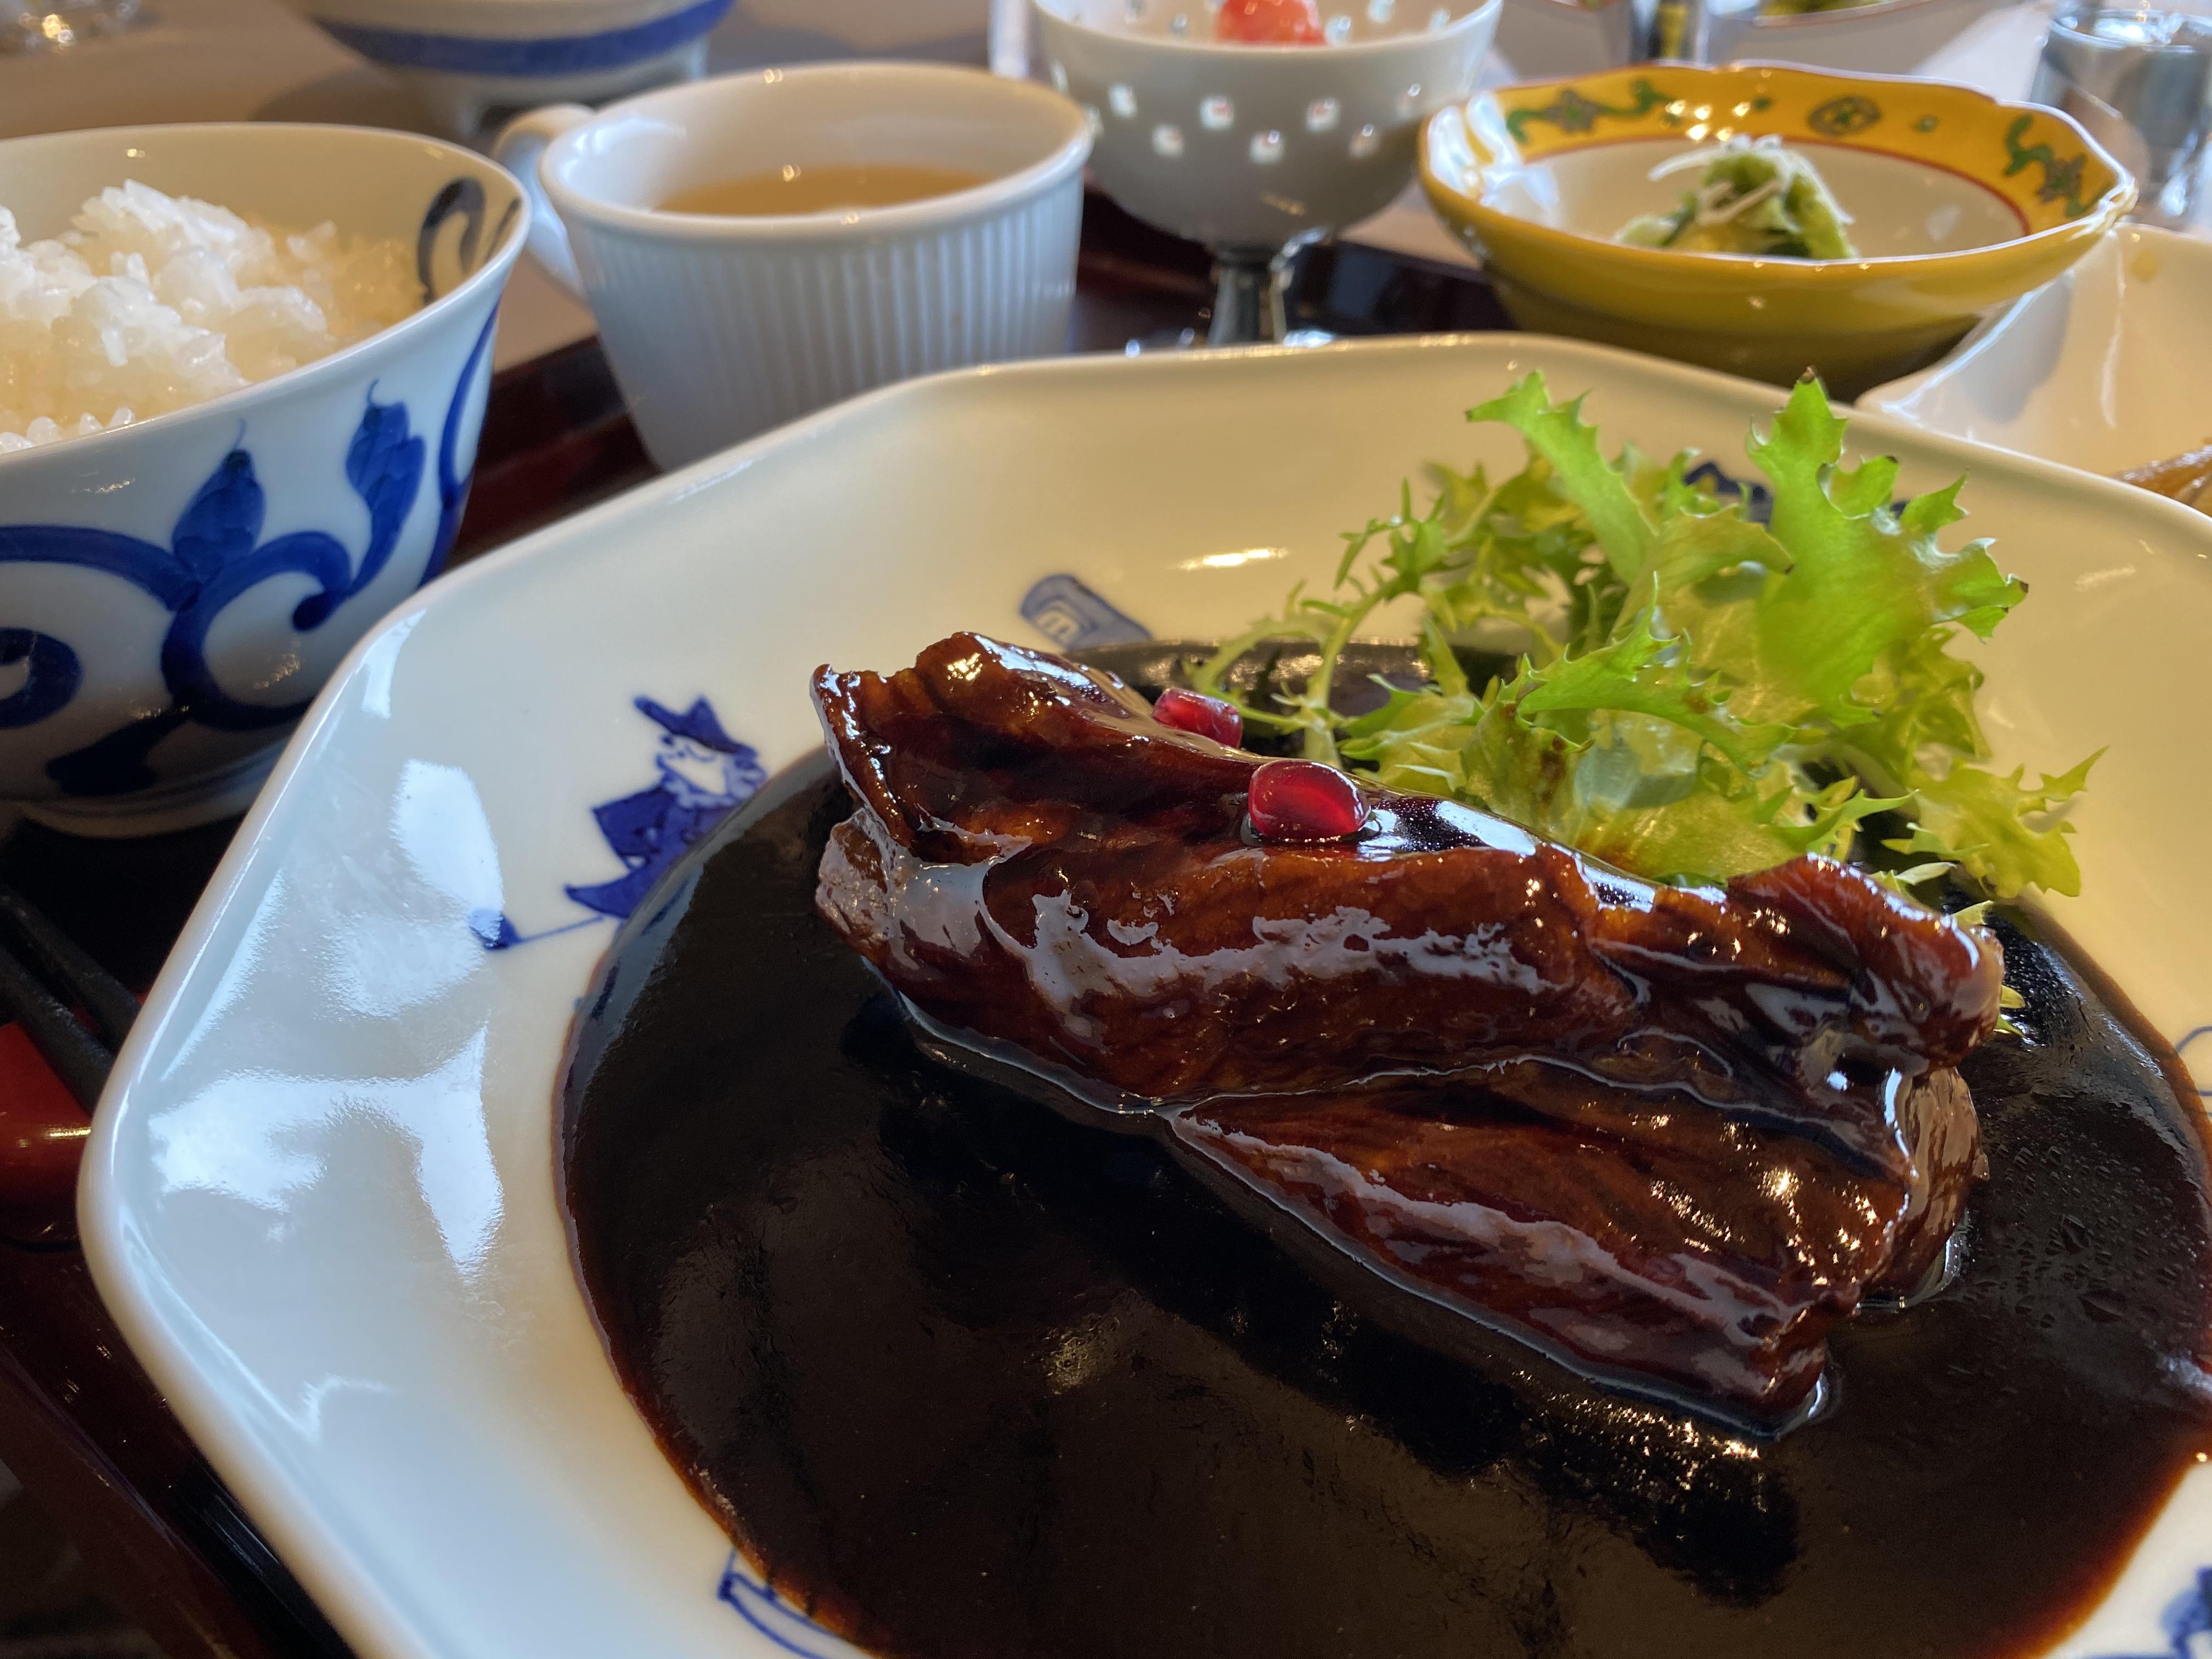 <p>レストランメニューは中華の名店「桃の木」が監修。こんな酢豚がいただけます</p>